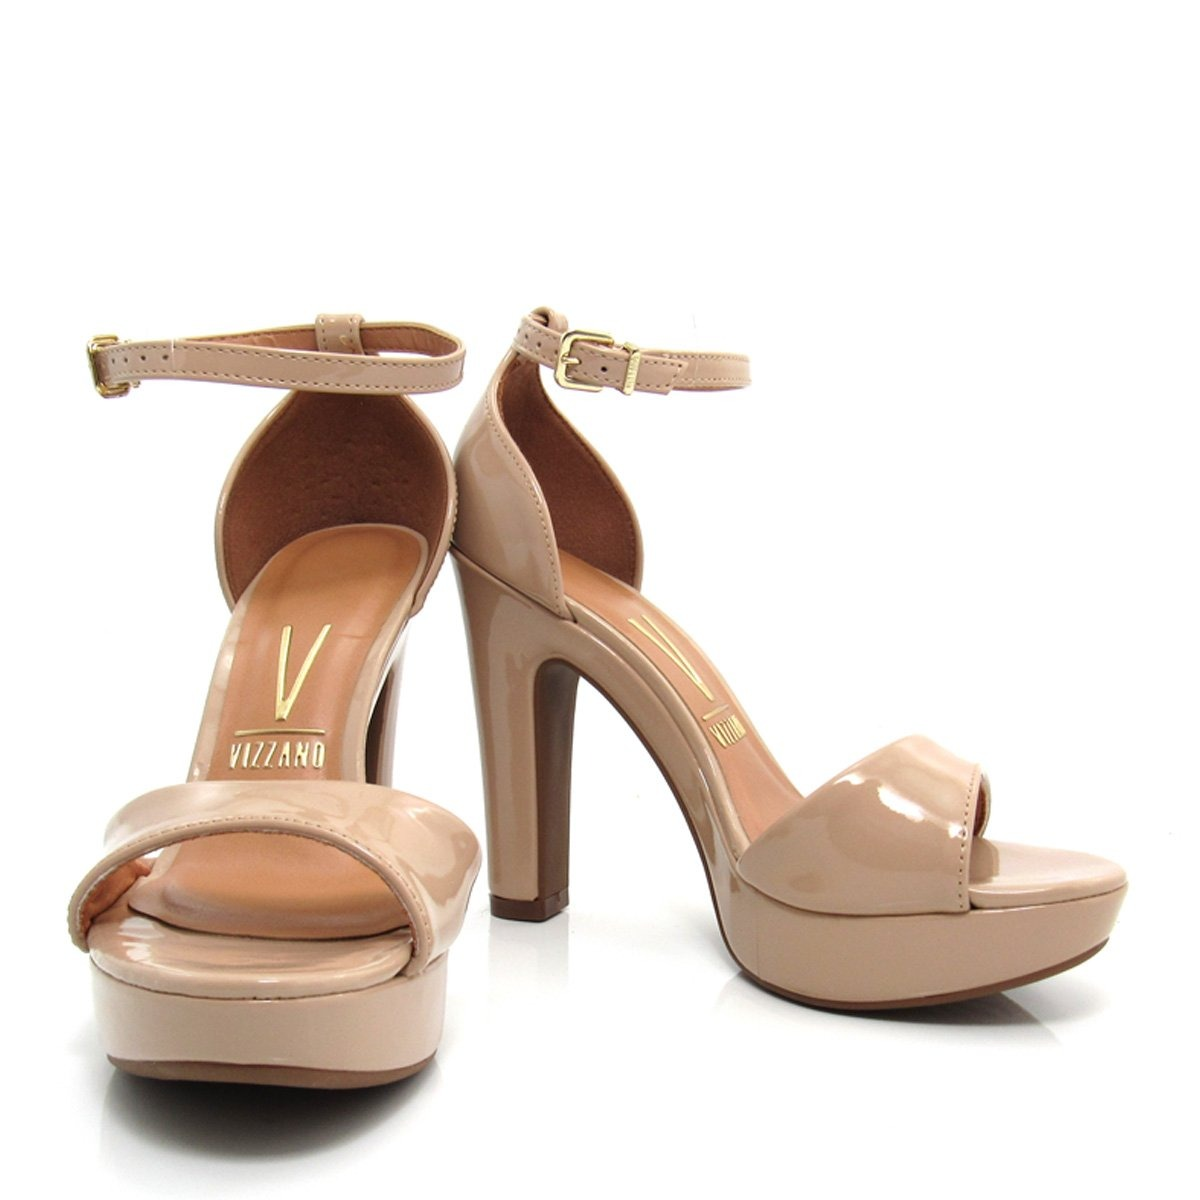 2f7ab3d82b sandália vizzano meia pata salto grosso feminina 6292117. Carregando zoom.